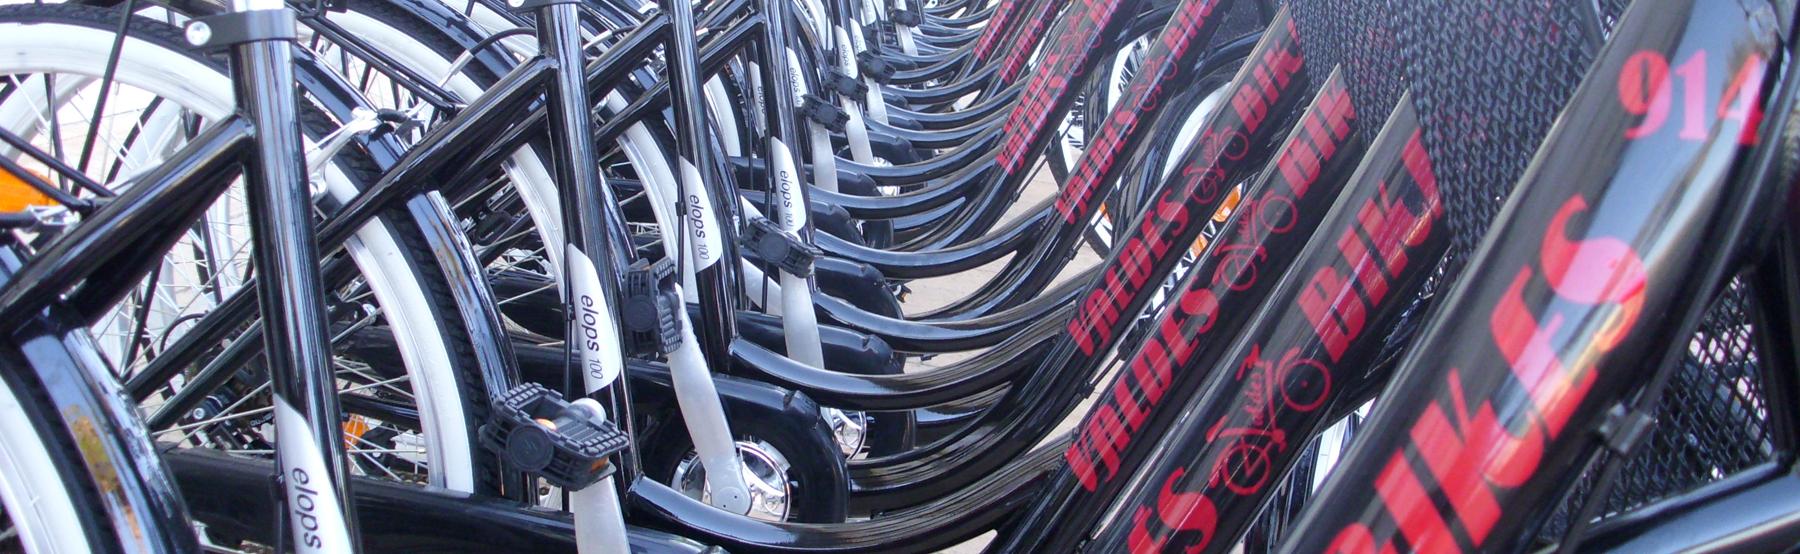 Alquiler de bicicletas Costa Ballena